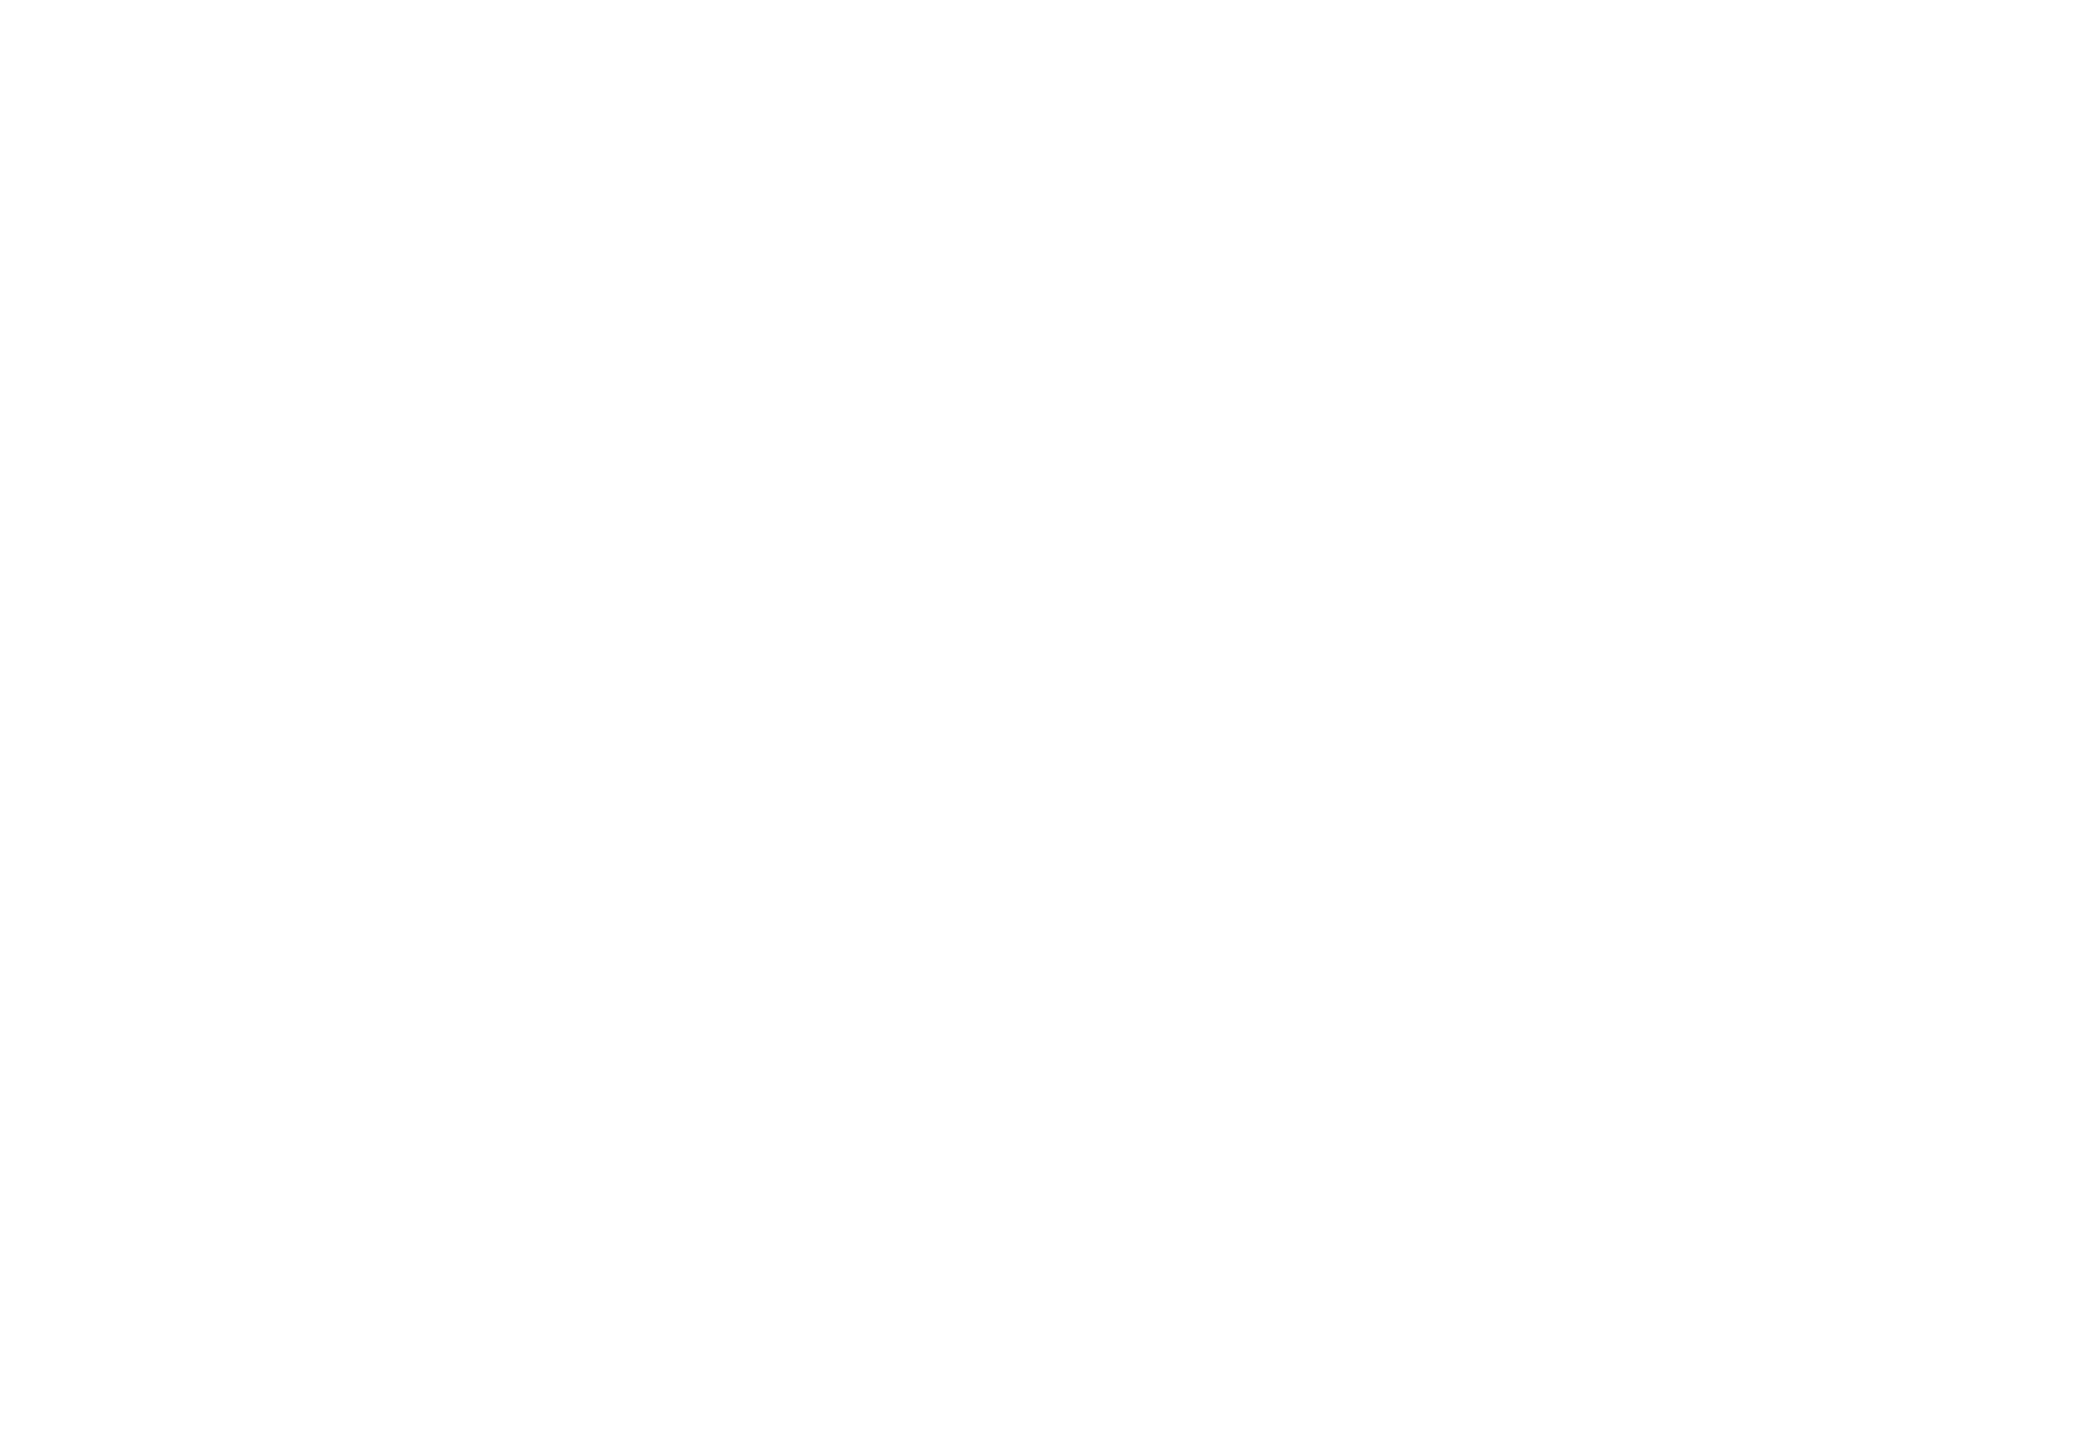 Open Folder designed by Freepik from Flaticon